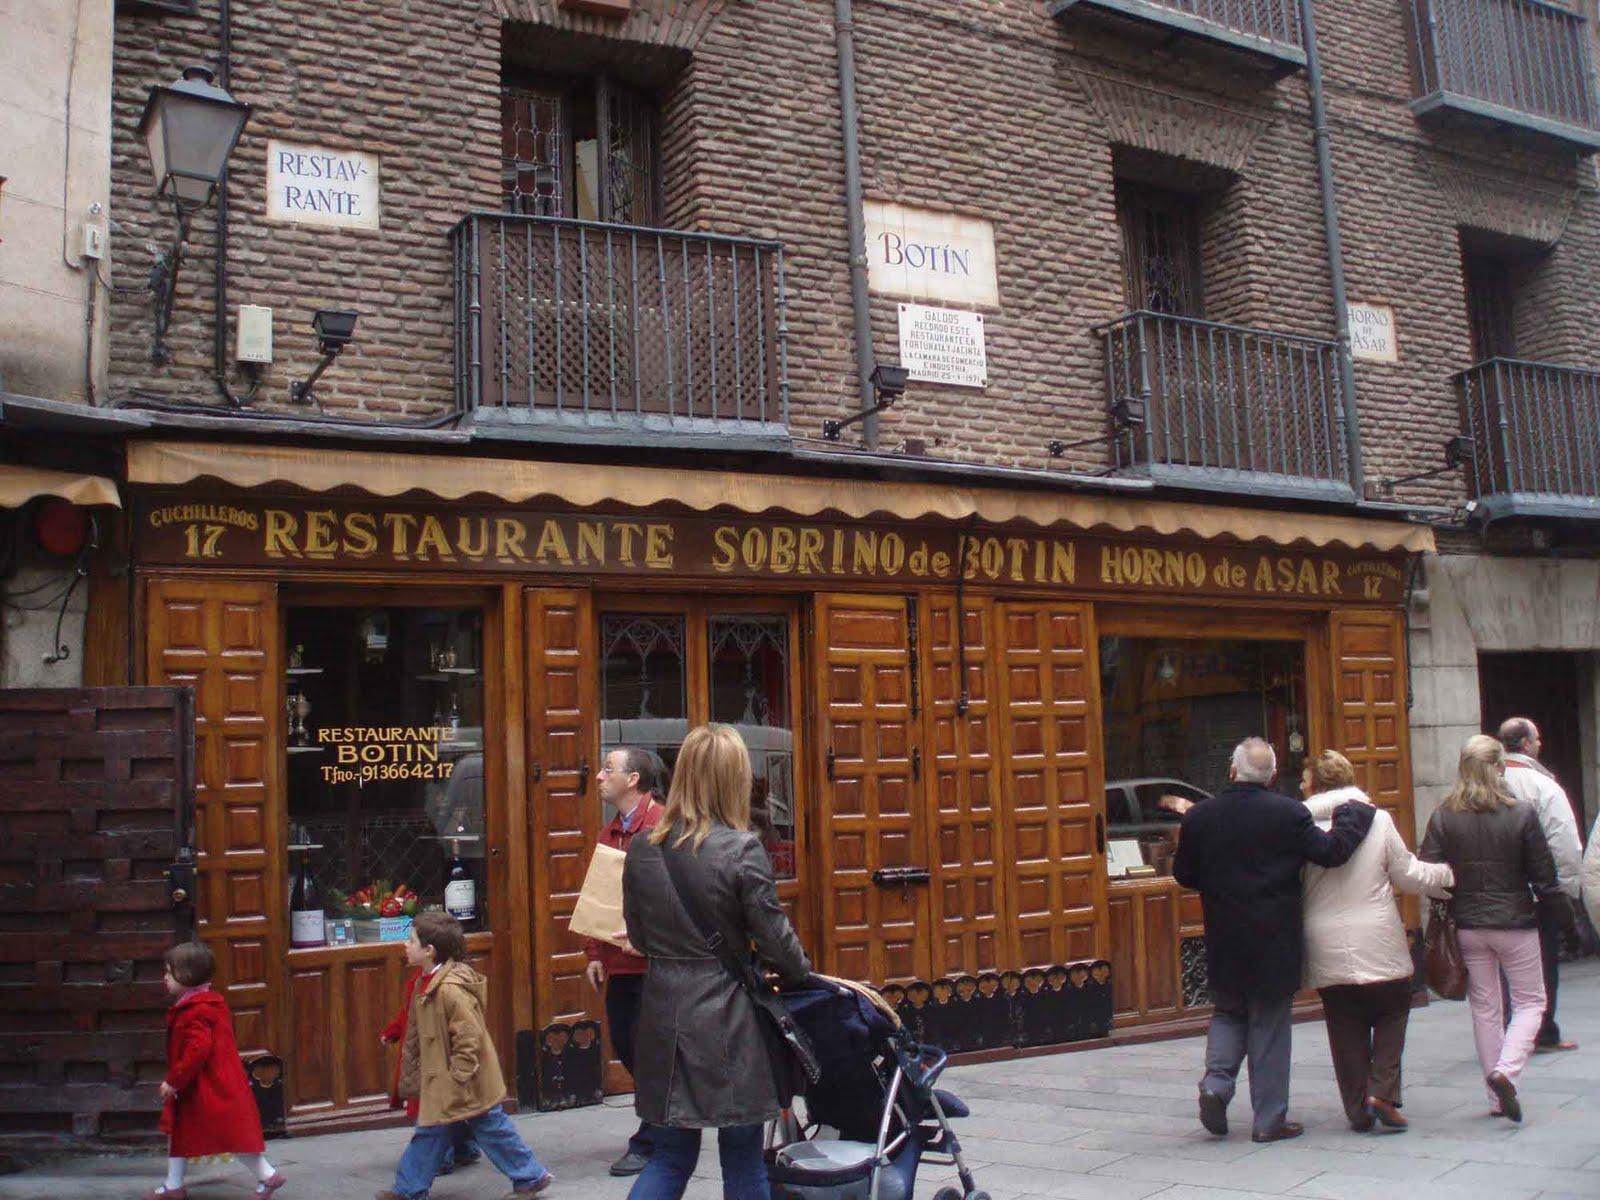 Sangria sol y siesta botin is the world 39 s oldest for Casa botin madrid